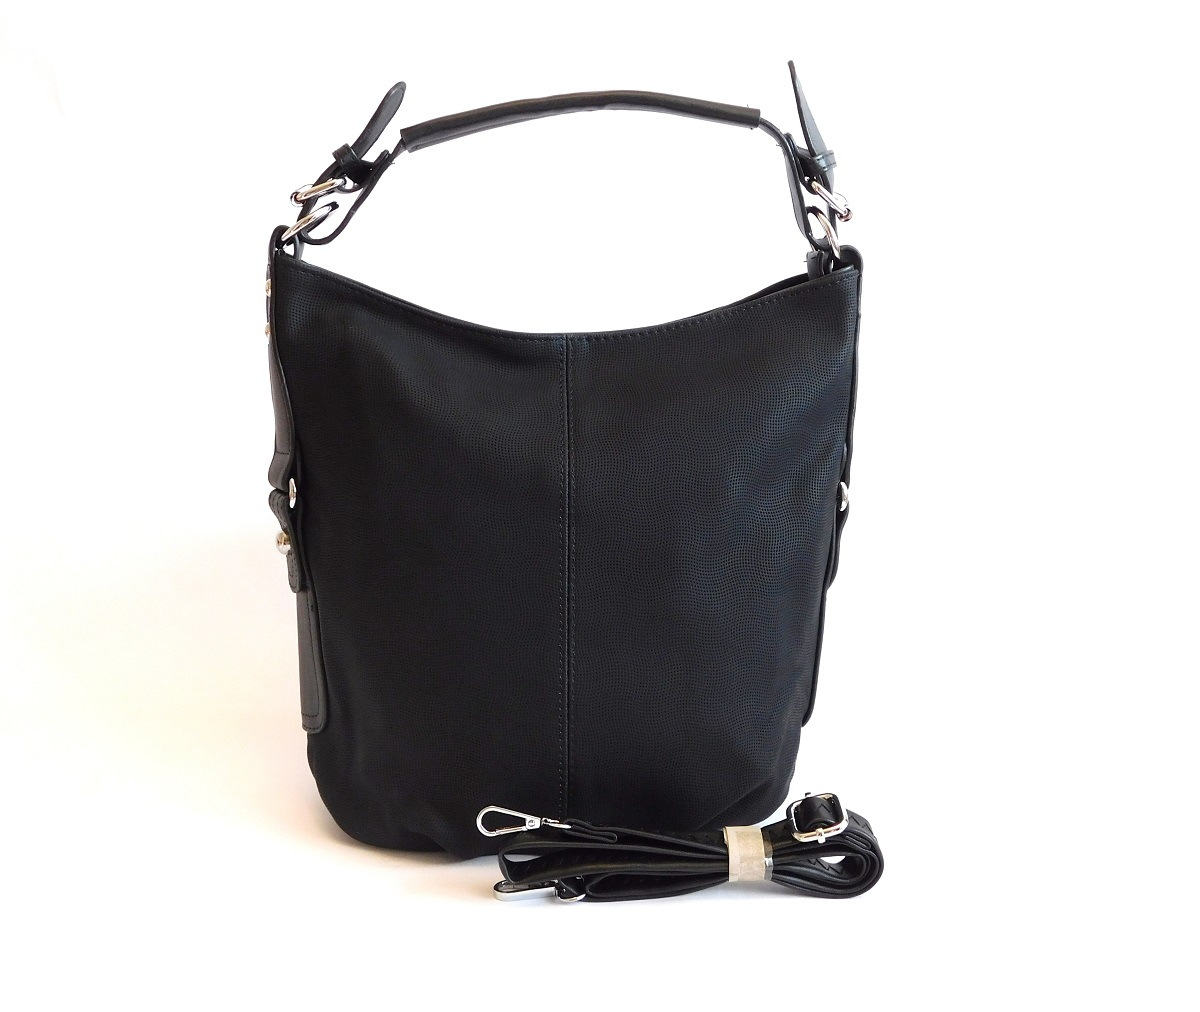 Černá kabelka na rameno ROMINA & CO 16022